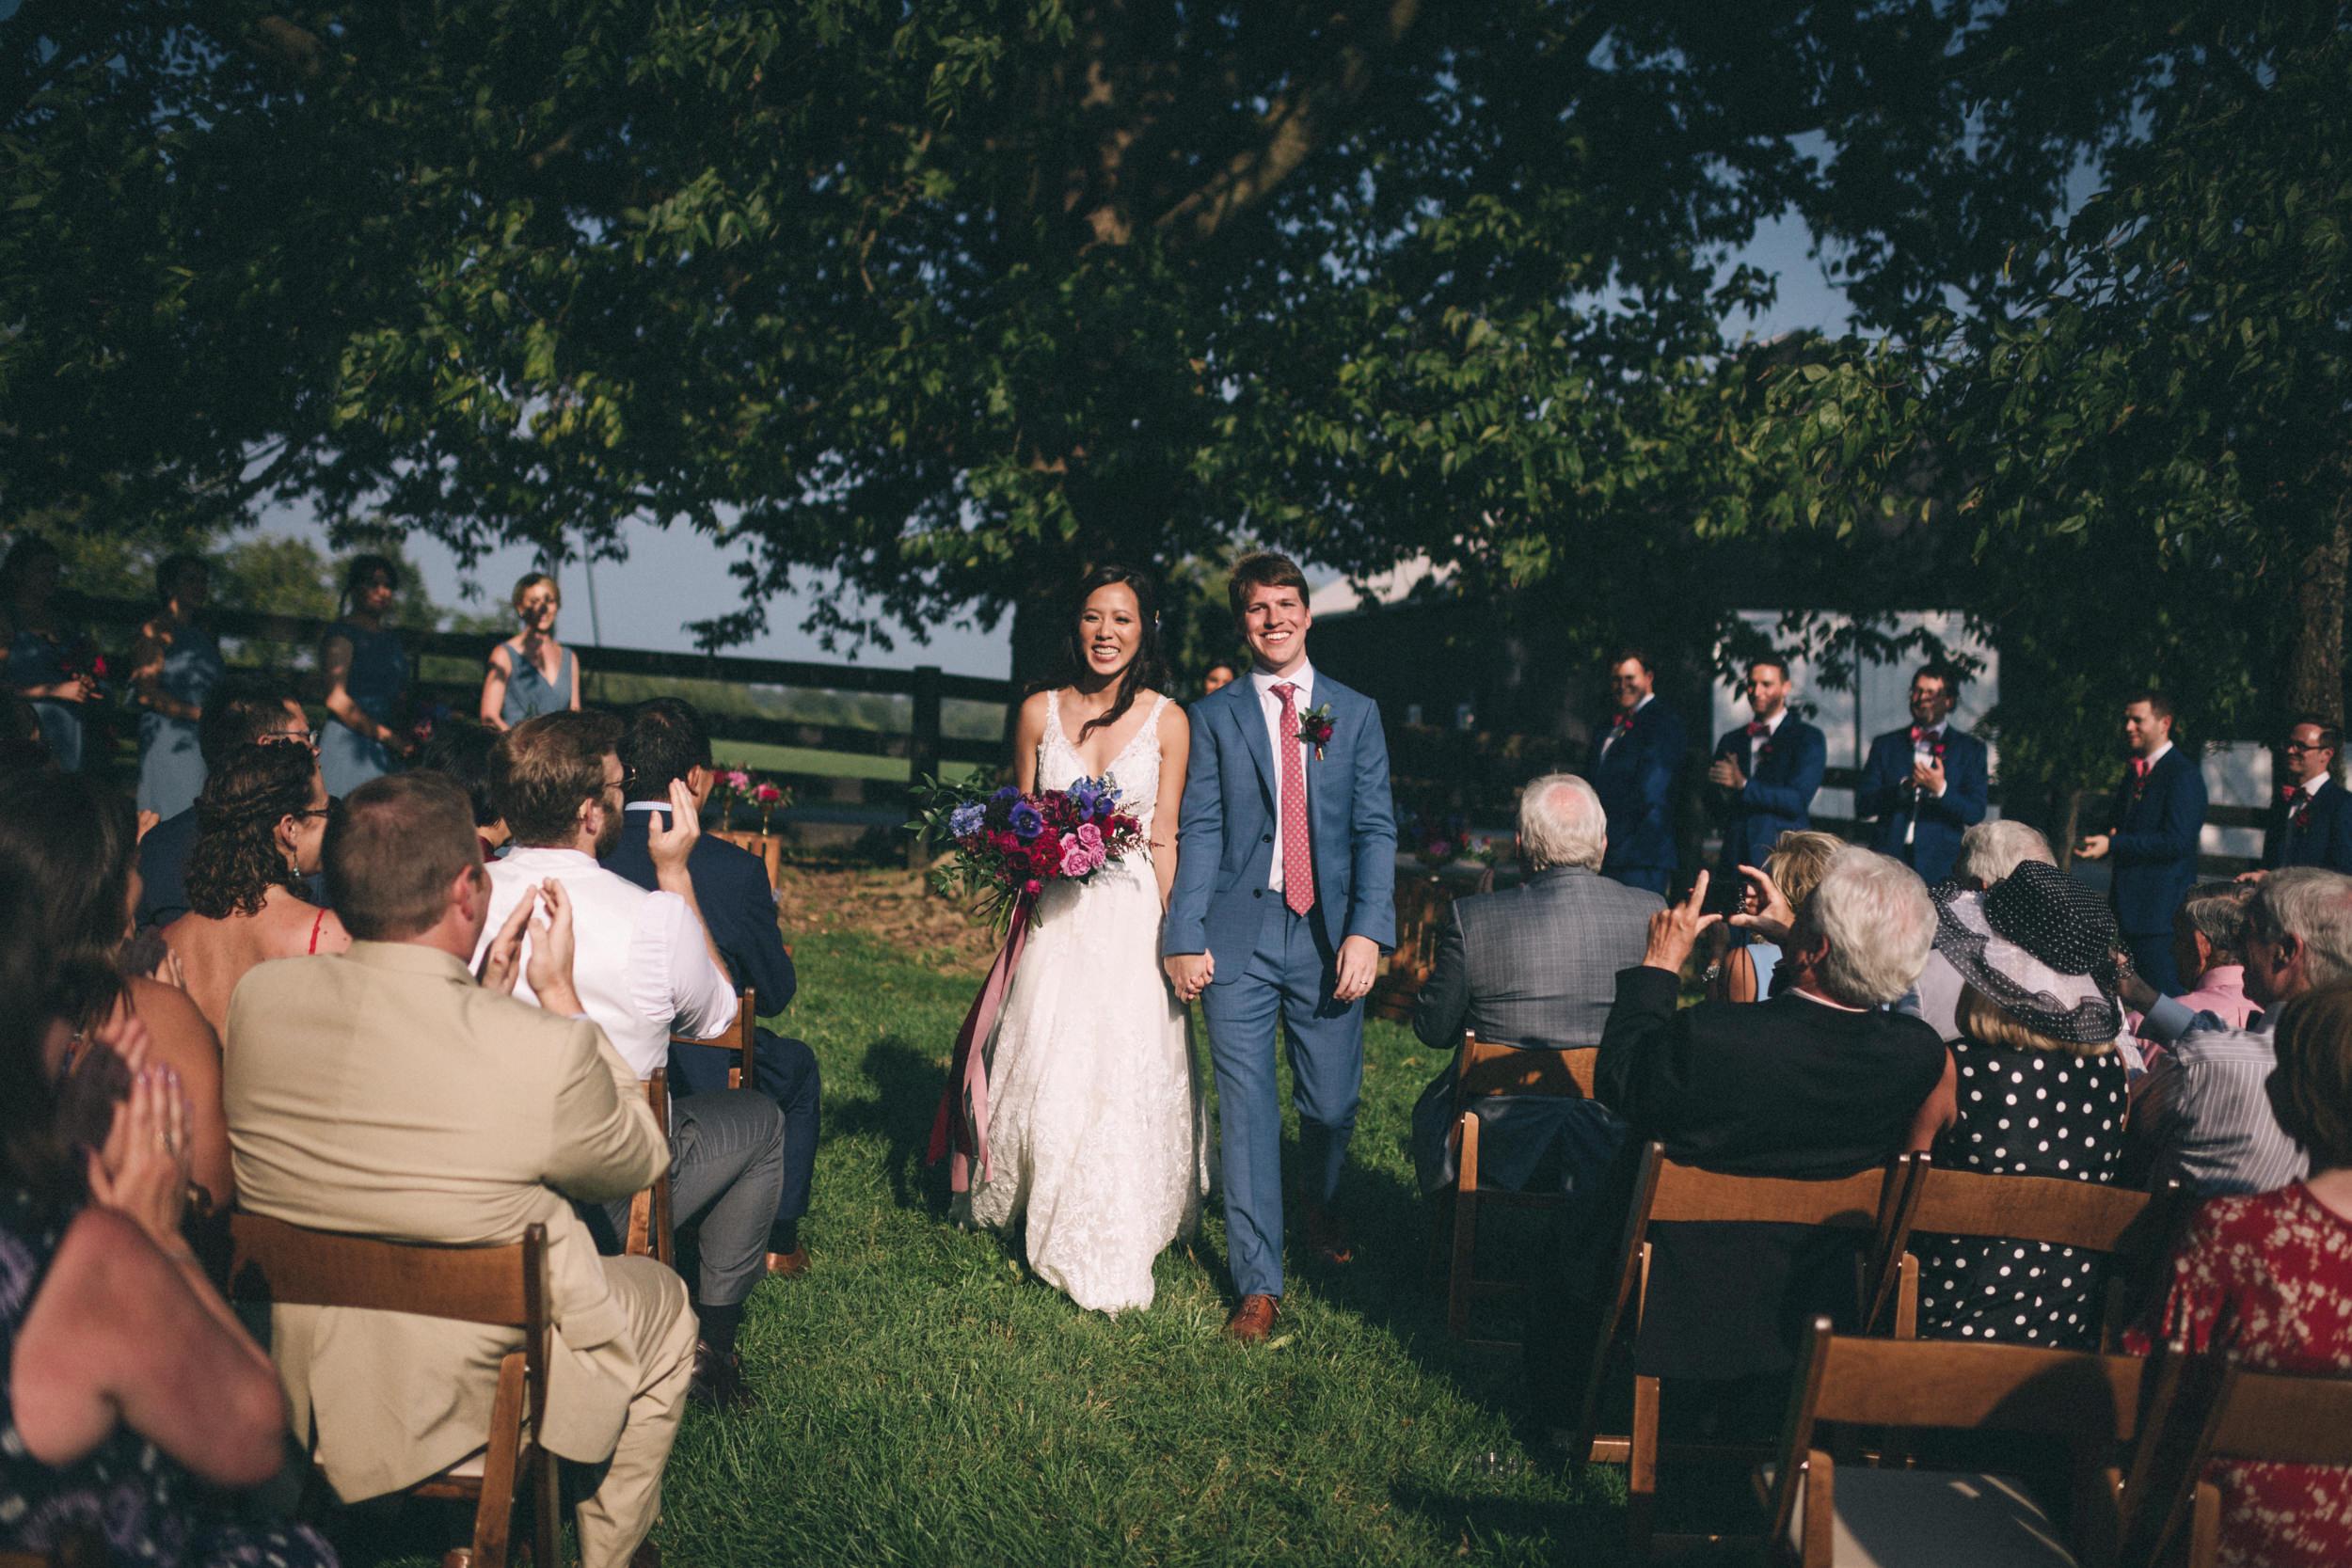 Louisville-Kentucky-Wedding-and-Elopement-Photographer-Sarah-Katherine-Davis-Photography-Summer-Jewel-Toned-Wedding-Chineese-Tea-Ceremony-Warrenwood-Manor-Danville-597.jpg